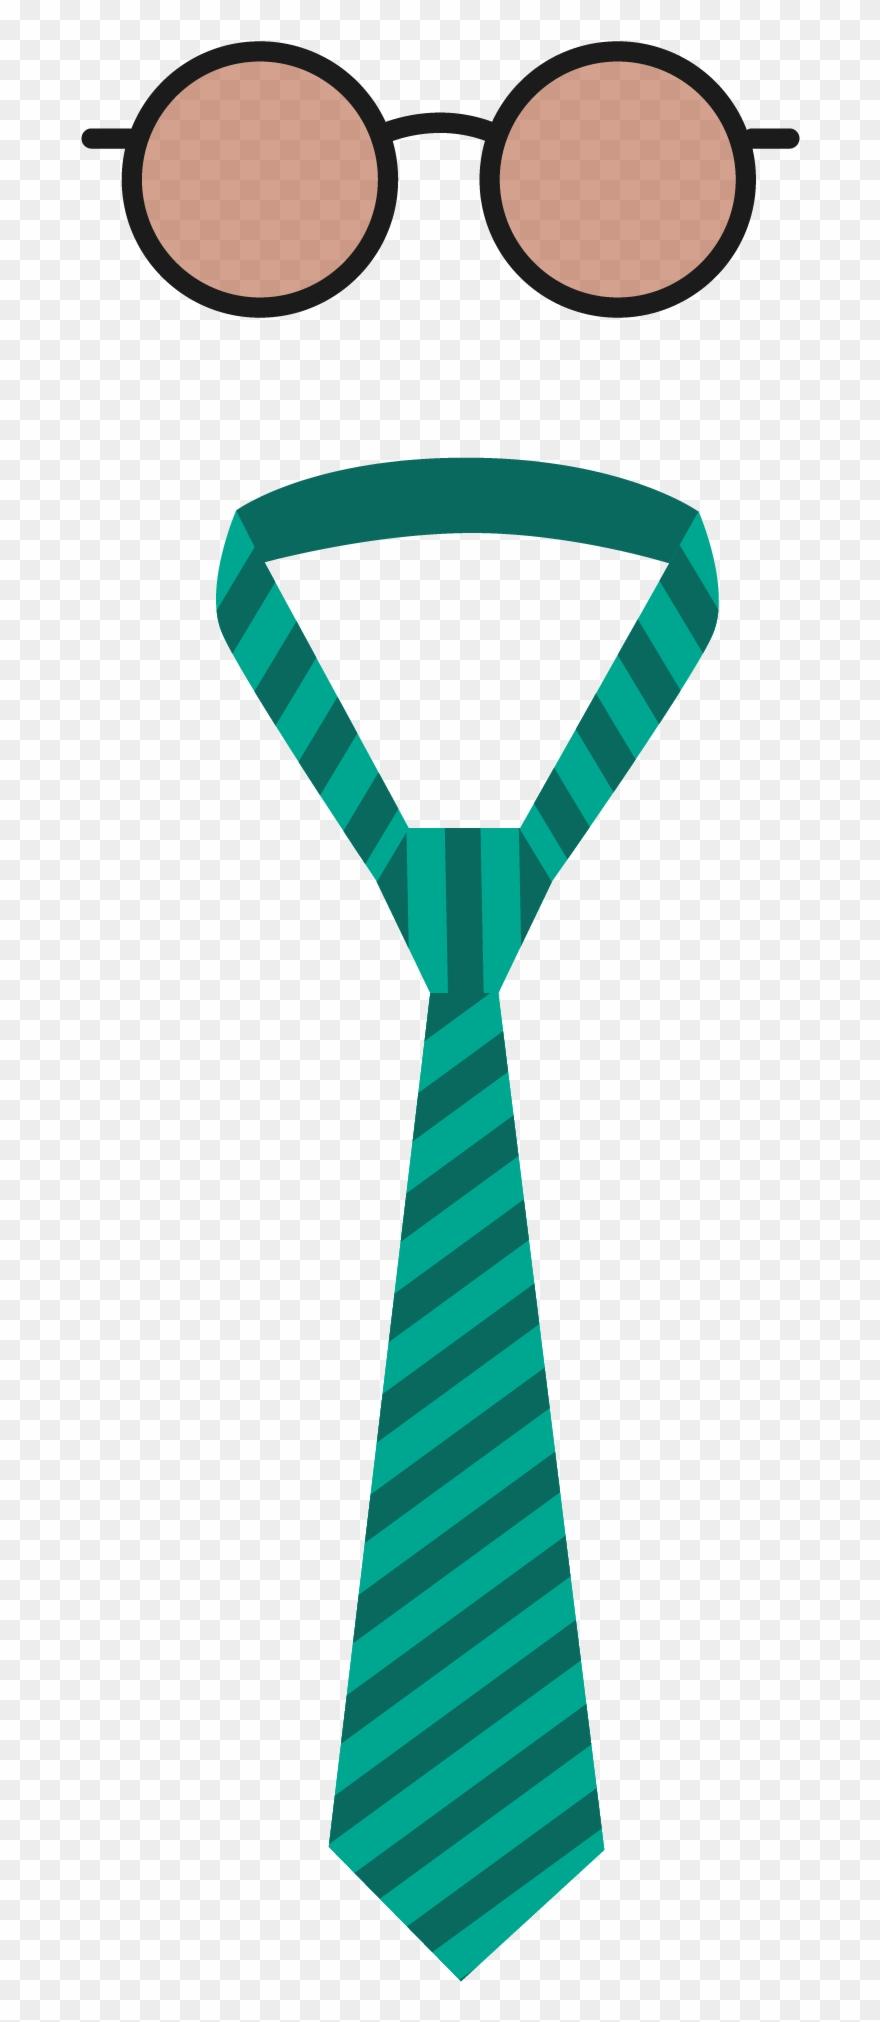 Corbata clipart clip transparent download Clip Art Transparent Stock Necktie Fathers Day Computer - Corbata ... clip transparent download